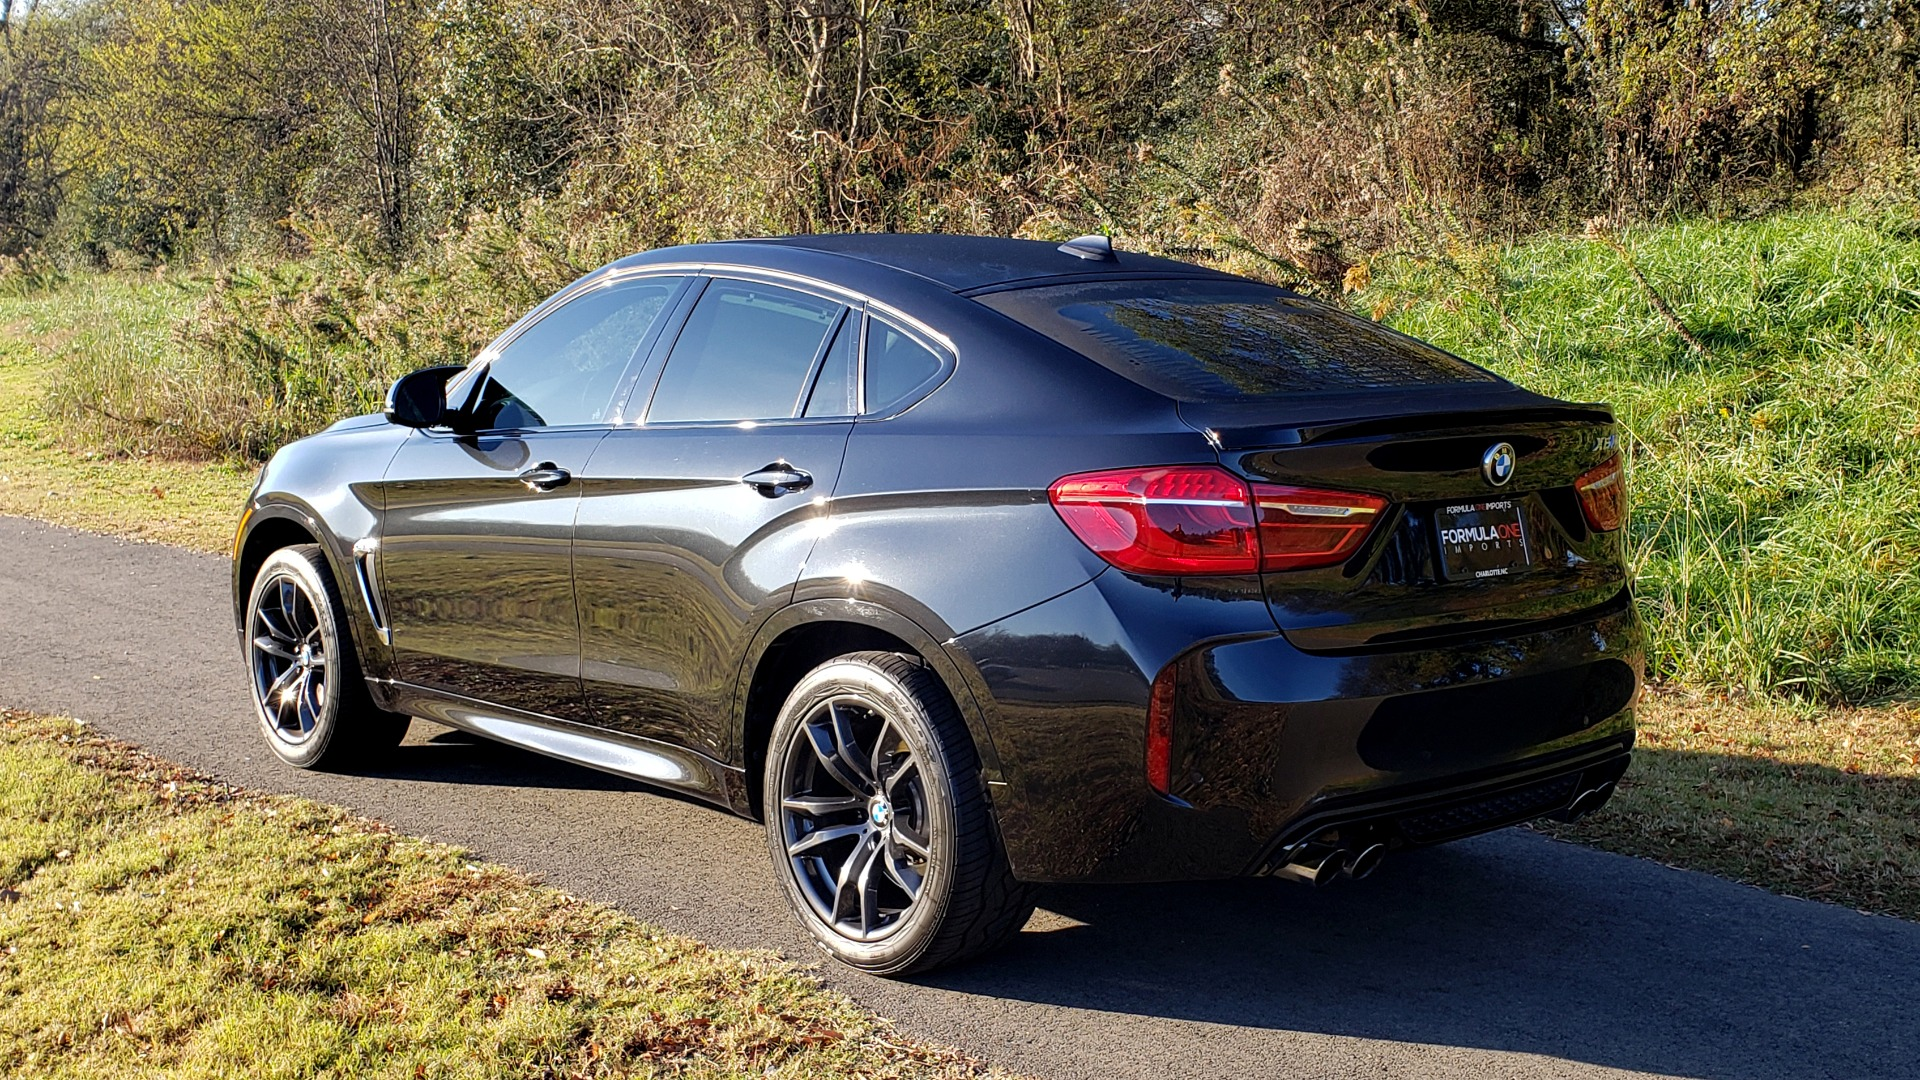 Used 2016 BMW X6 M EXEC PKG / DRVR ASST / NAV / SUNROOF / BLIND SPOT / REARVIEW for sale Sold at Formula Imports in Charlotte NC 28227 8